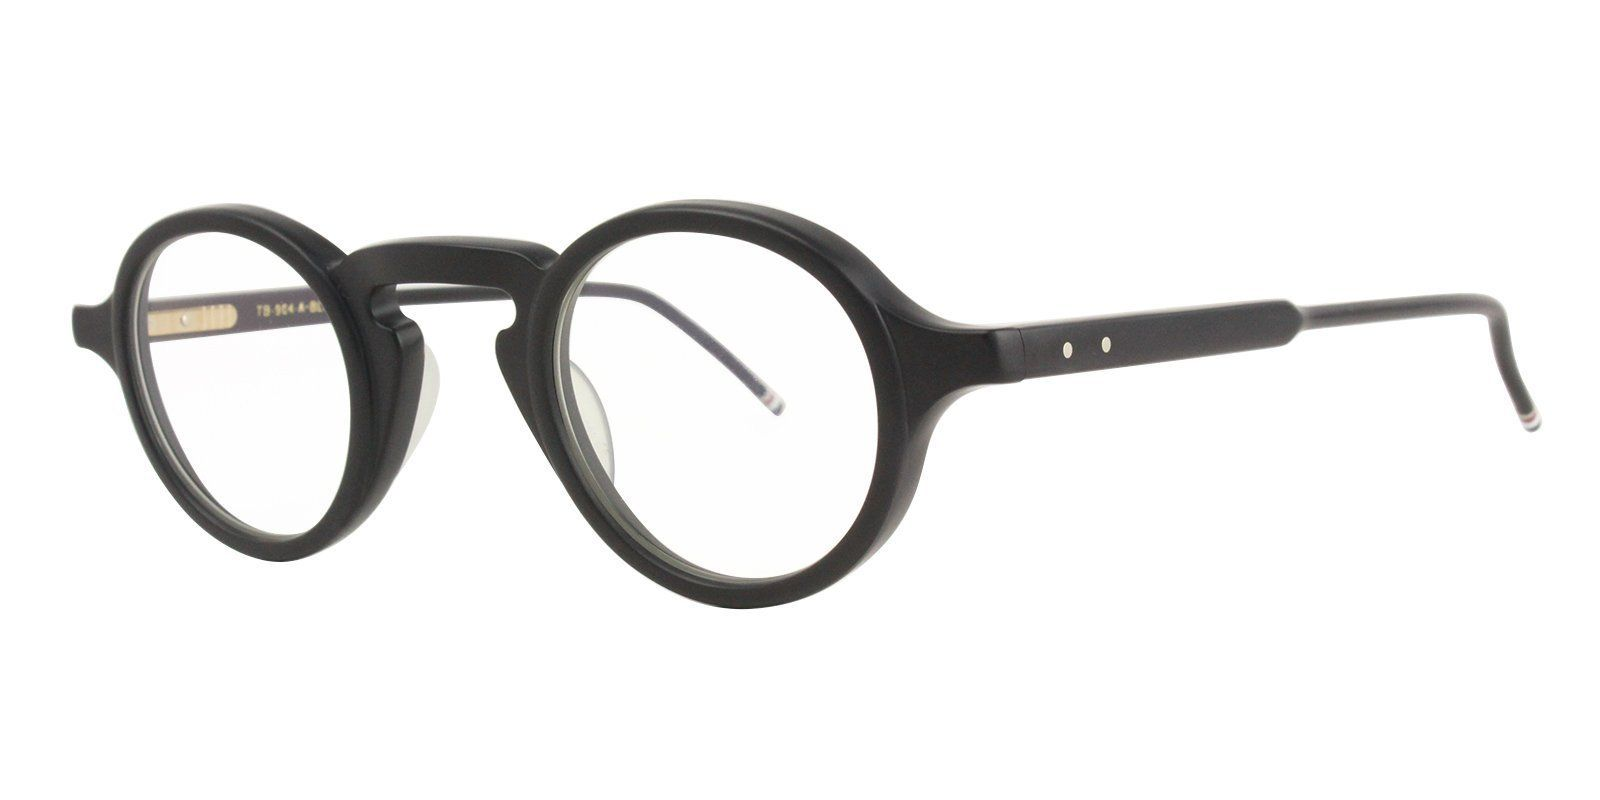 ad83c7c4d86 Thom Browne - TB-904-A Matte Black-eyeglasses-Designer Eyes